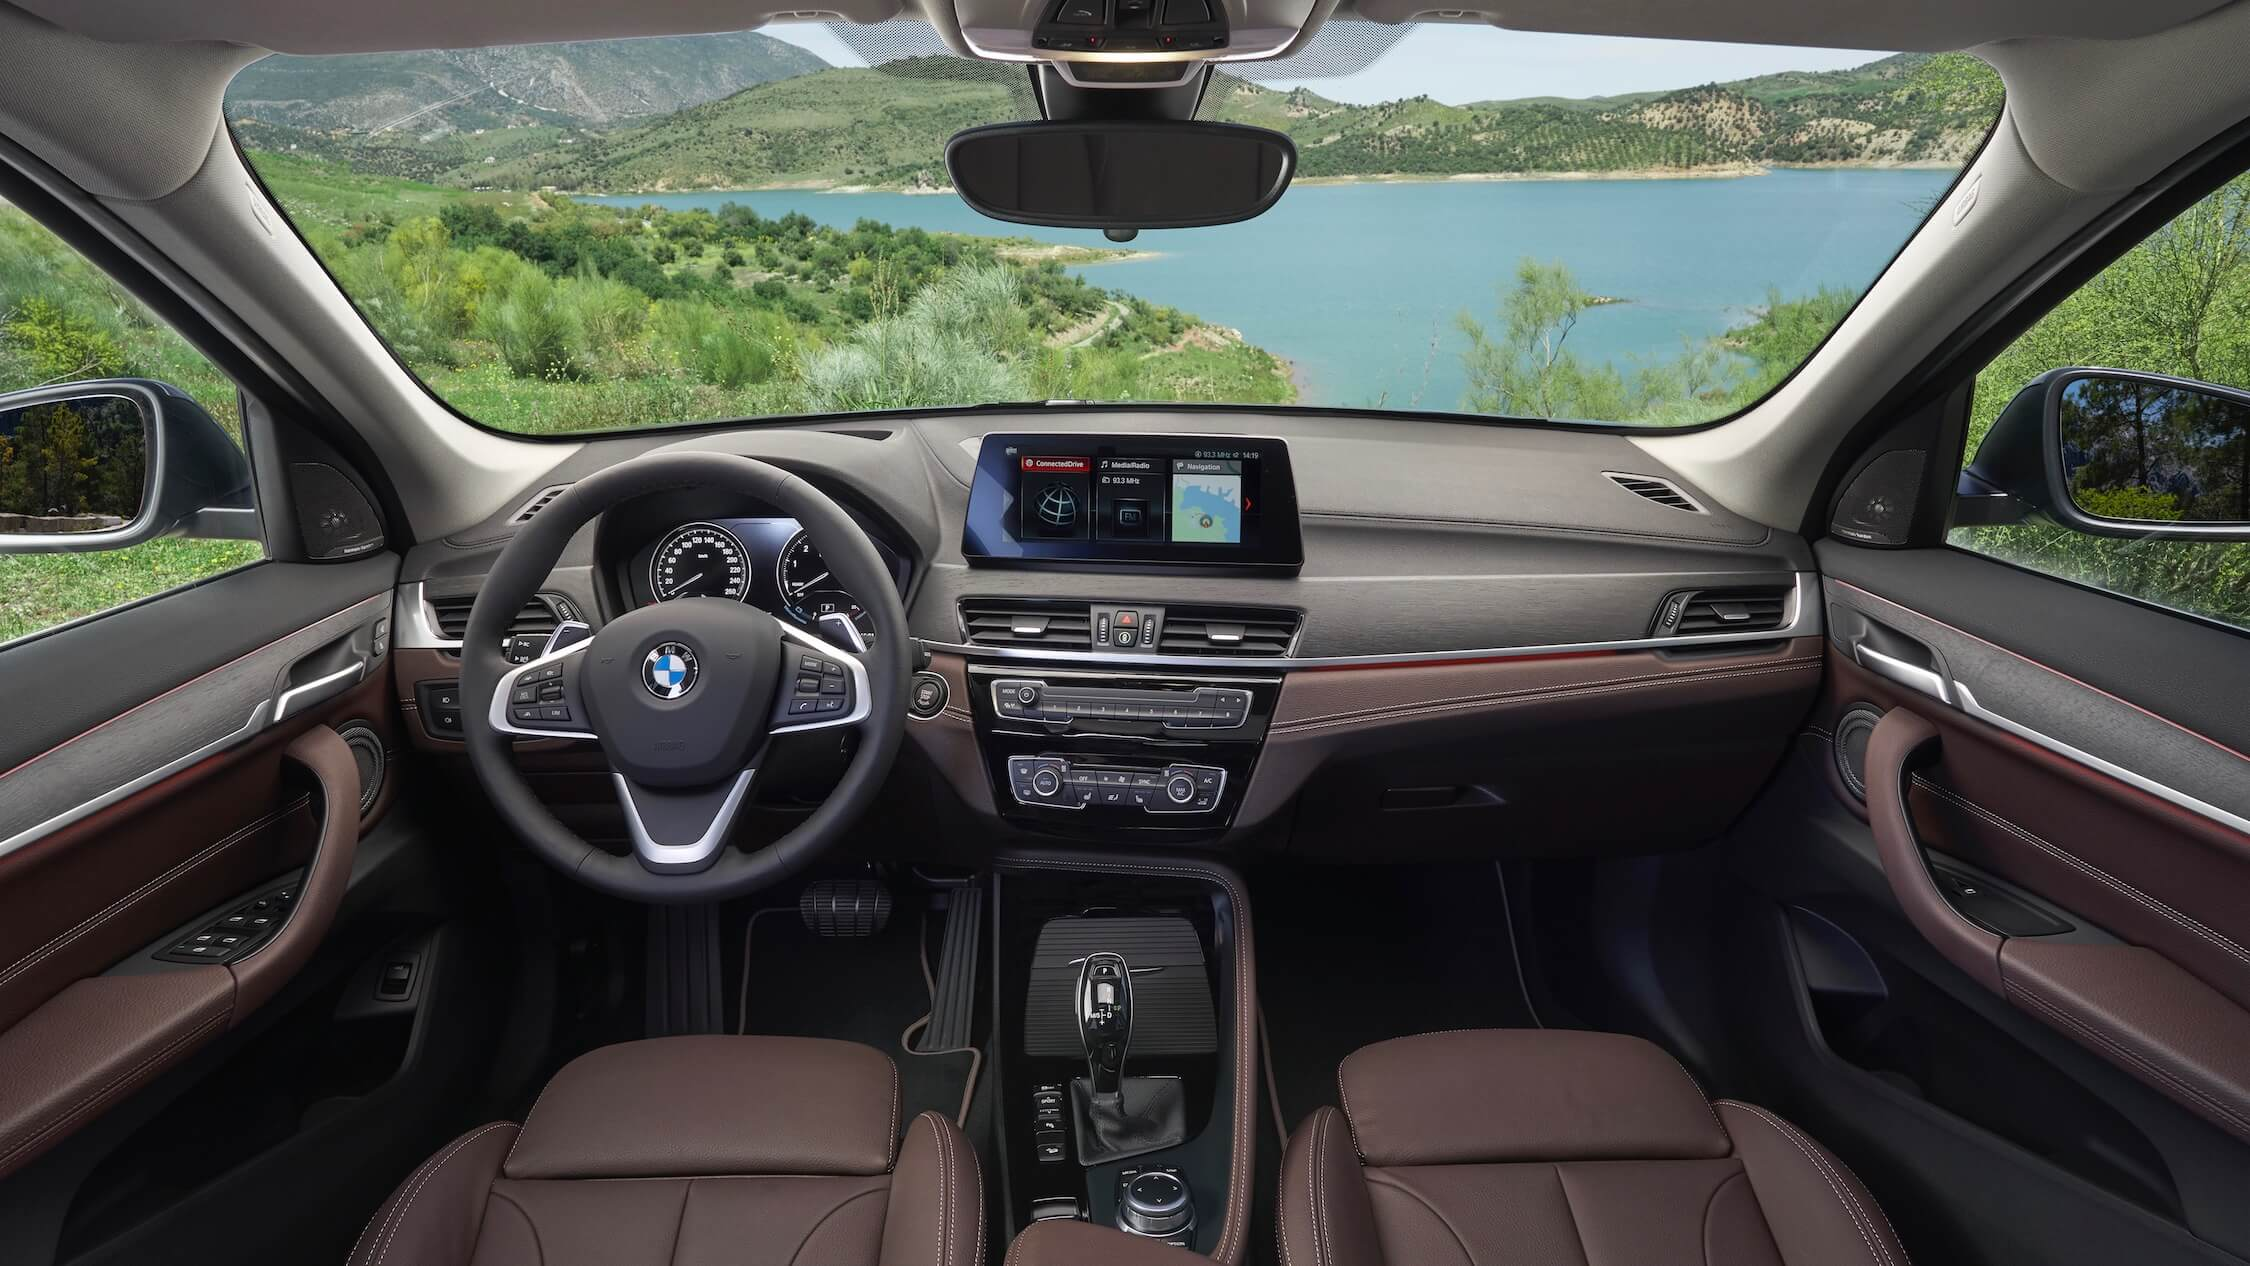 plug-in hybride BMW X1 interieur